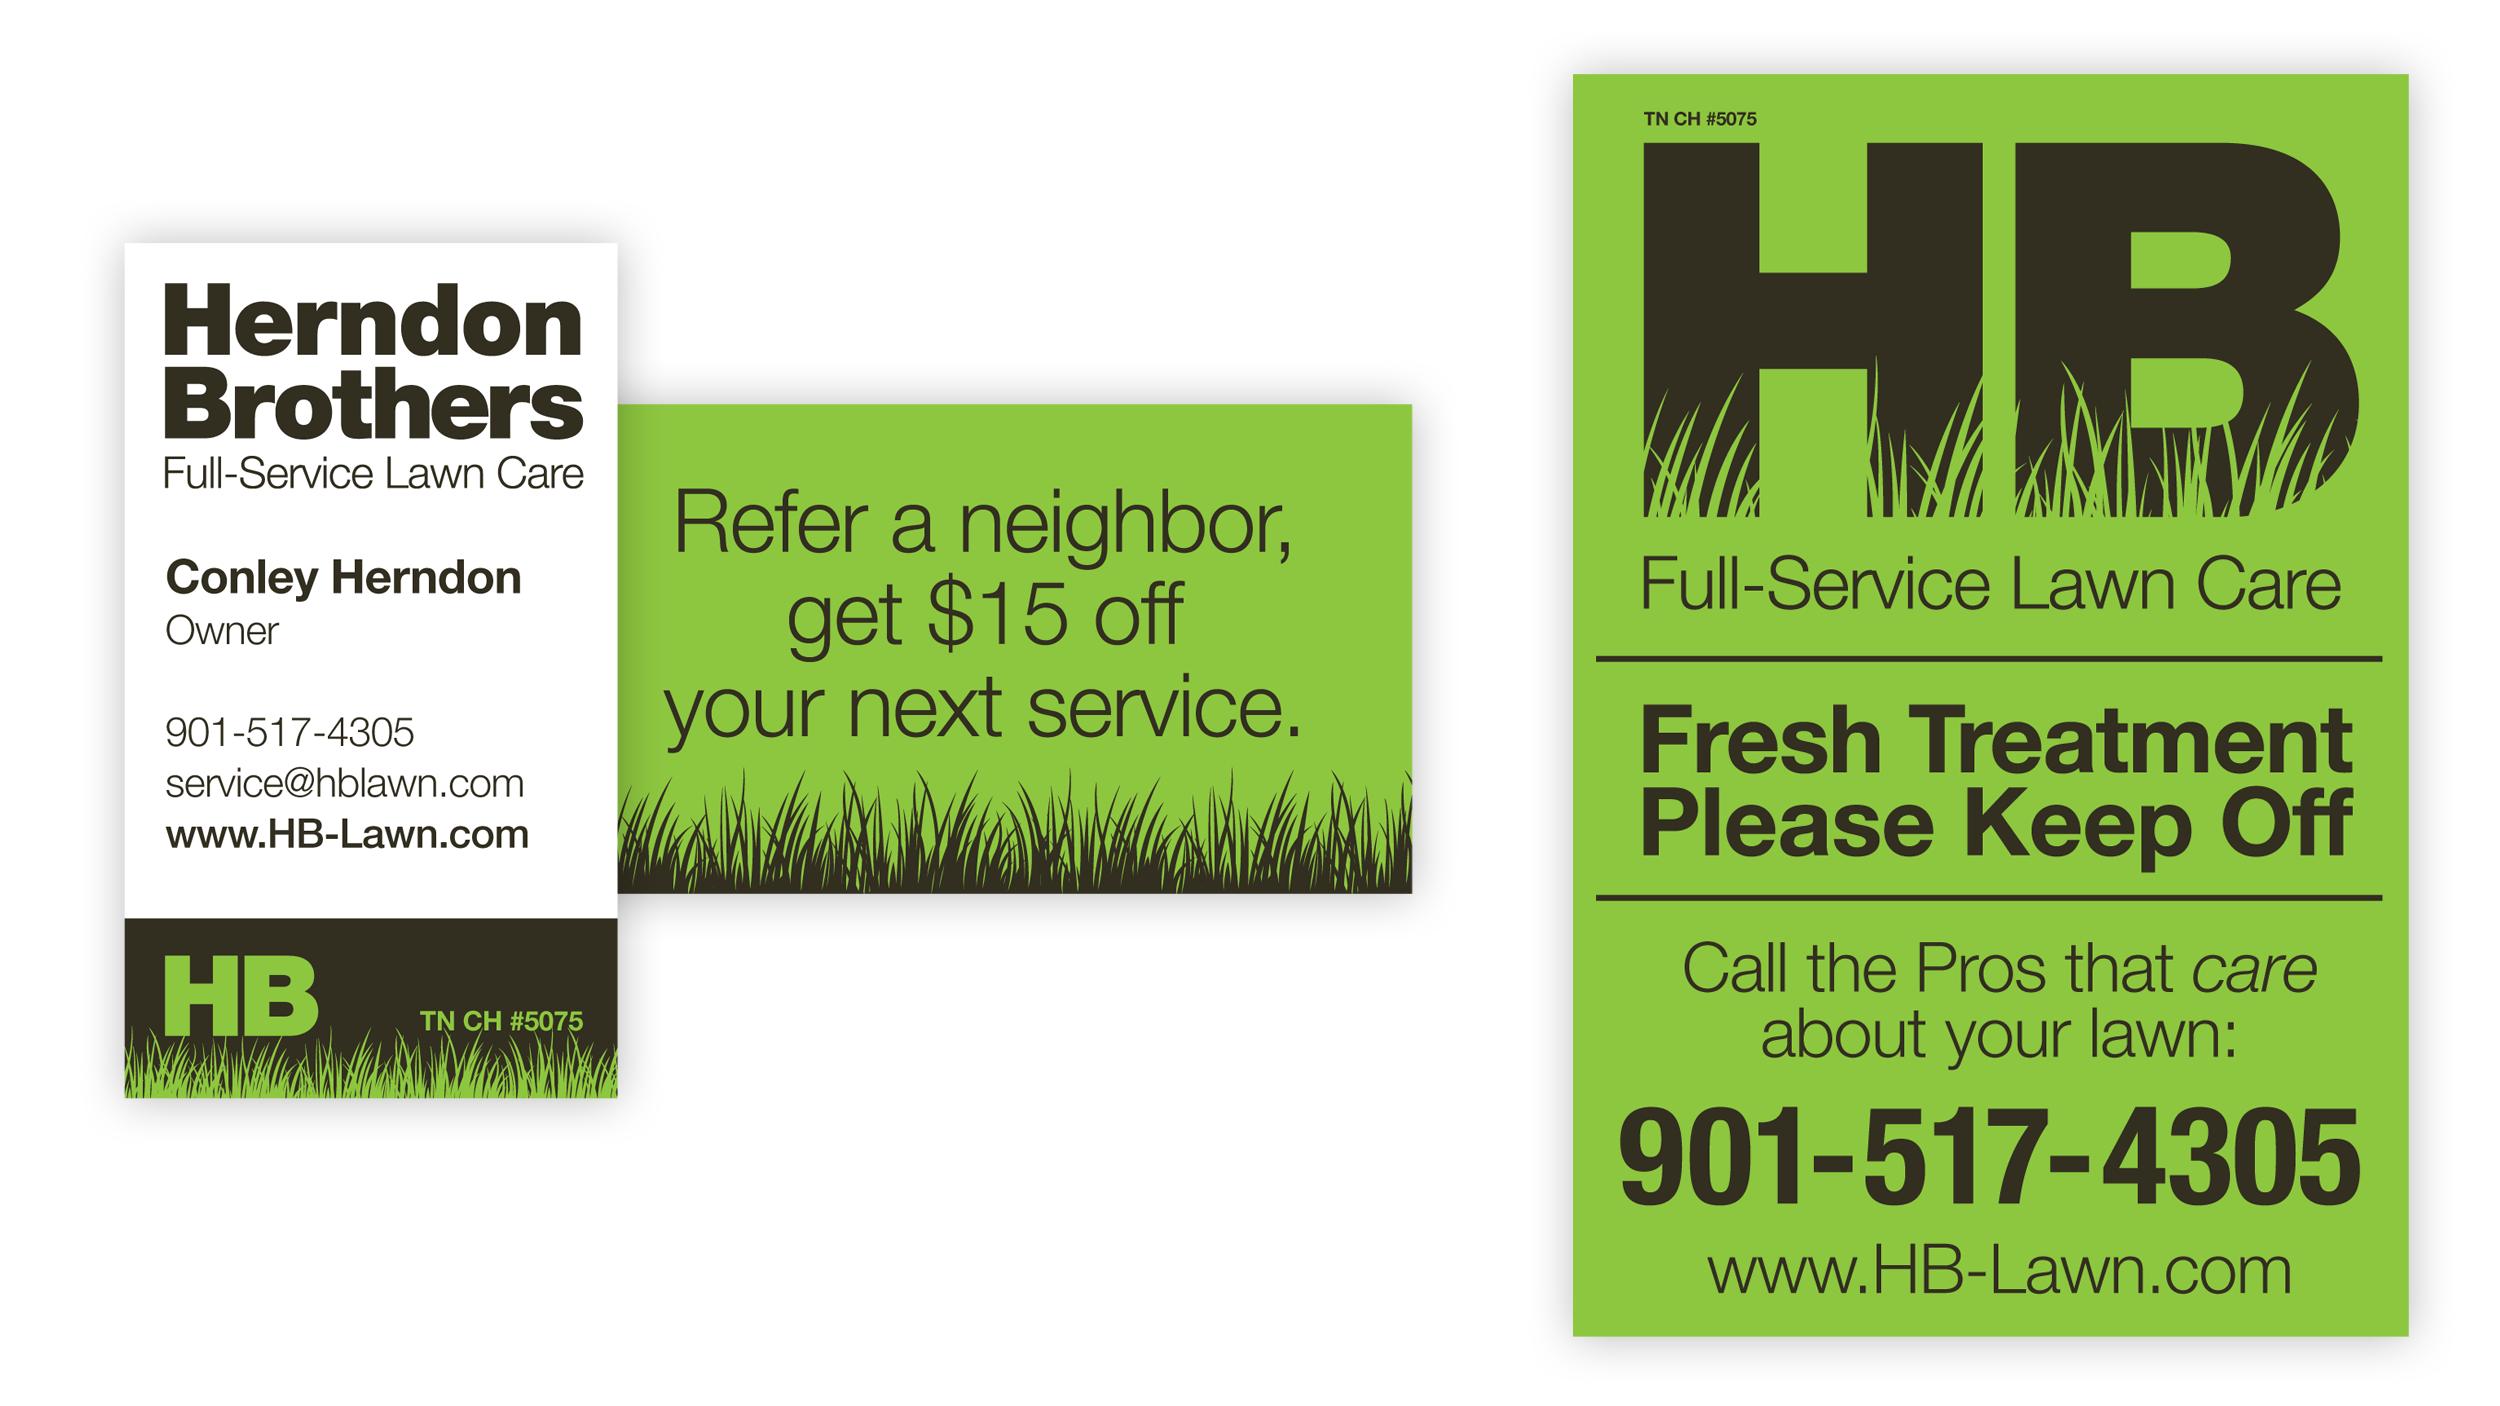 Herndon-Brothers-Lawn-Care_Print-Design_Dreamcapture_Memphis-TN_2